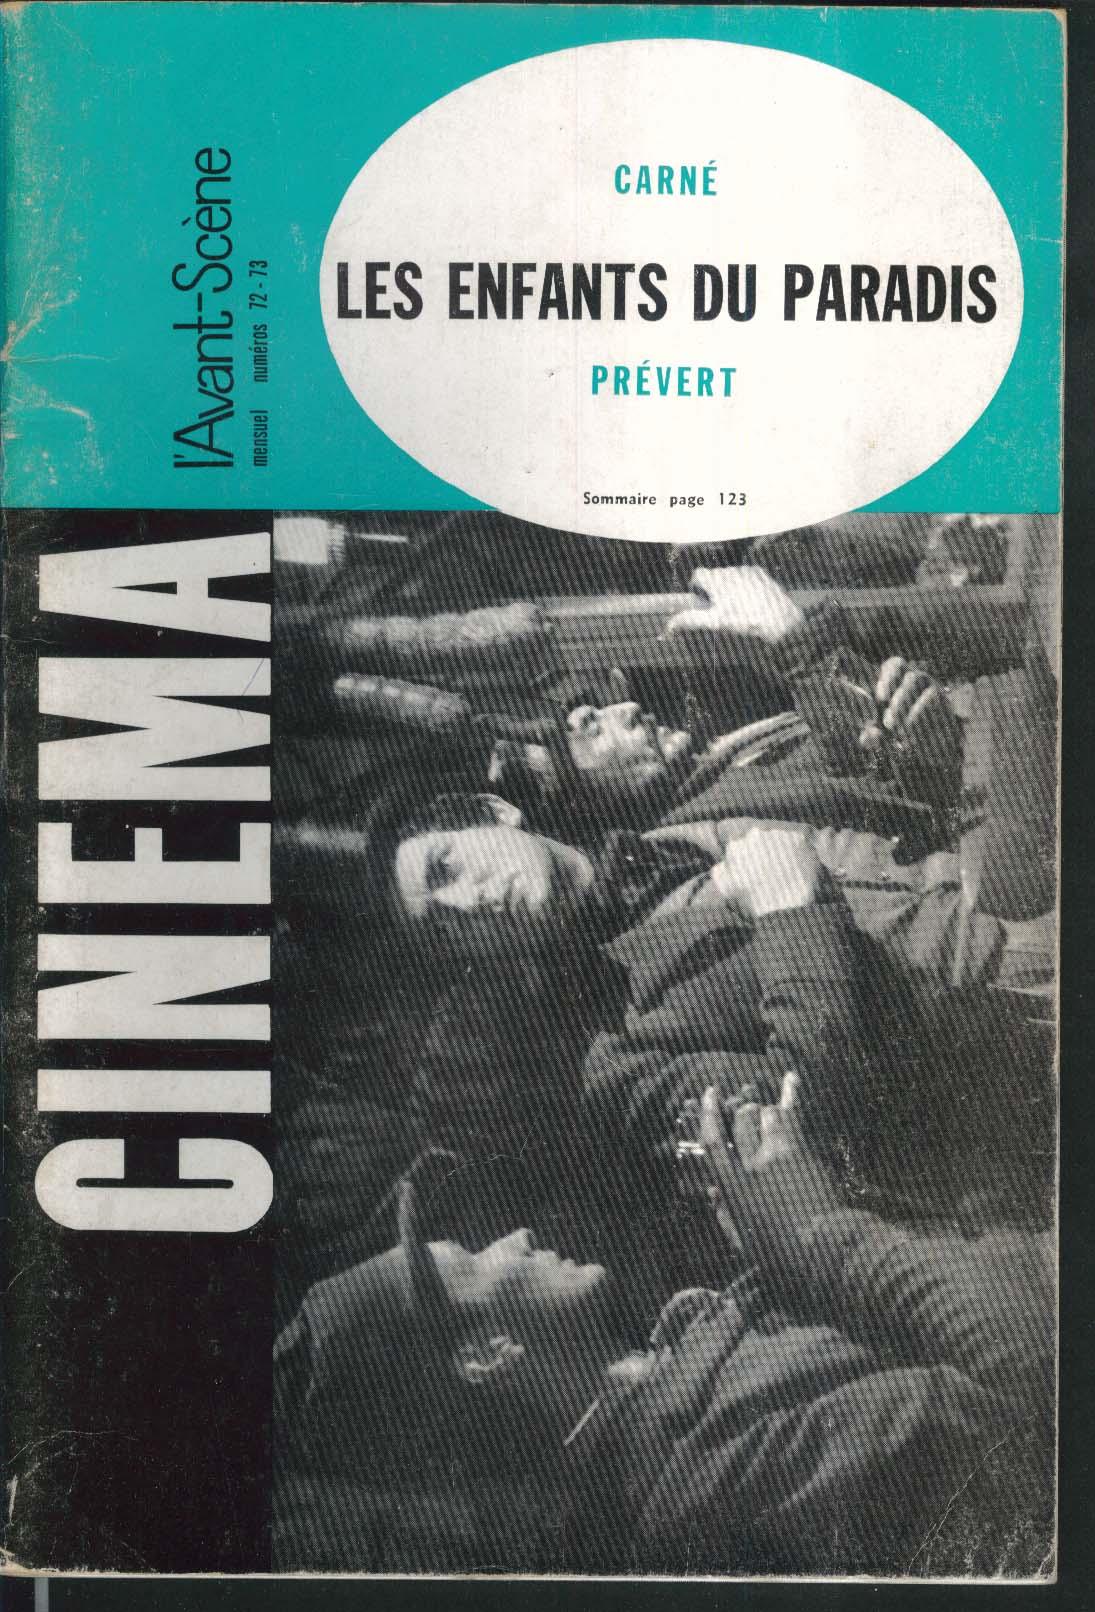 CINEMA #72-73 French-language movie magazine 1967